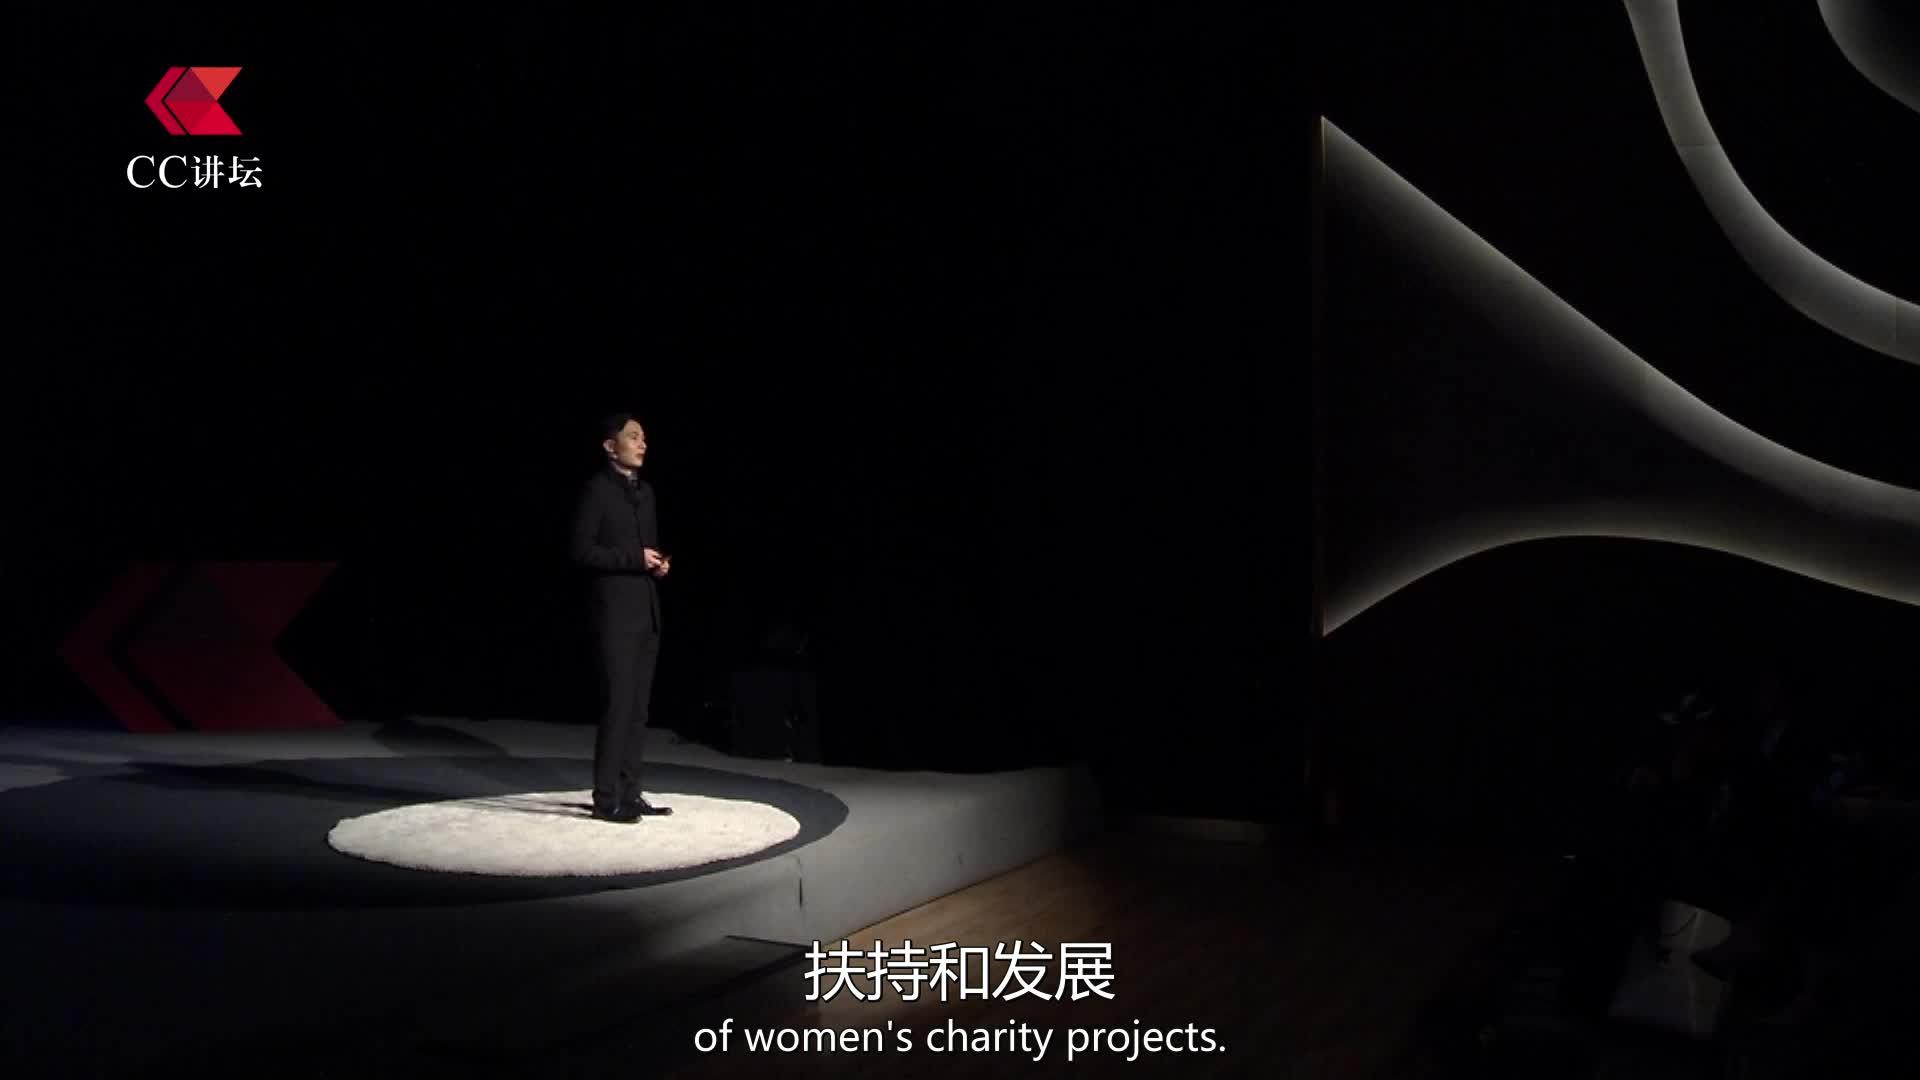 CC讲坛——赵光峰:妈妈制造——记录传统手工艺文化